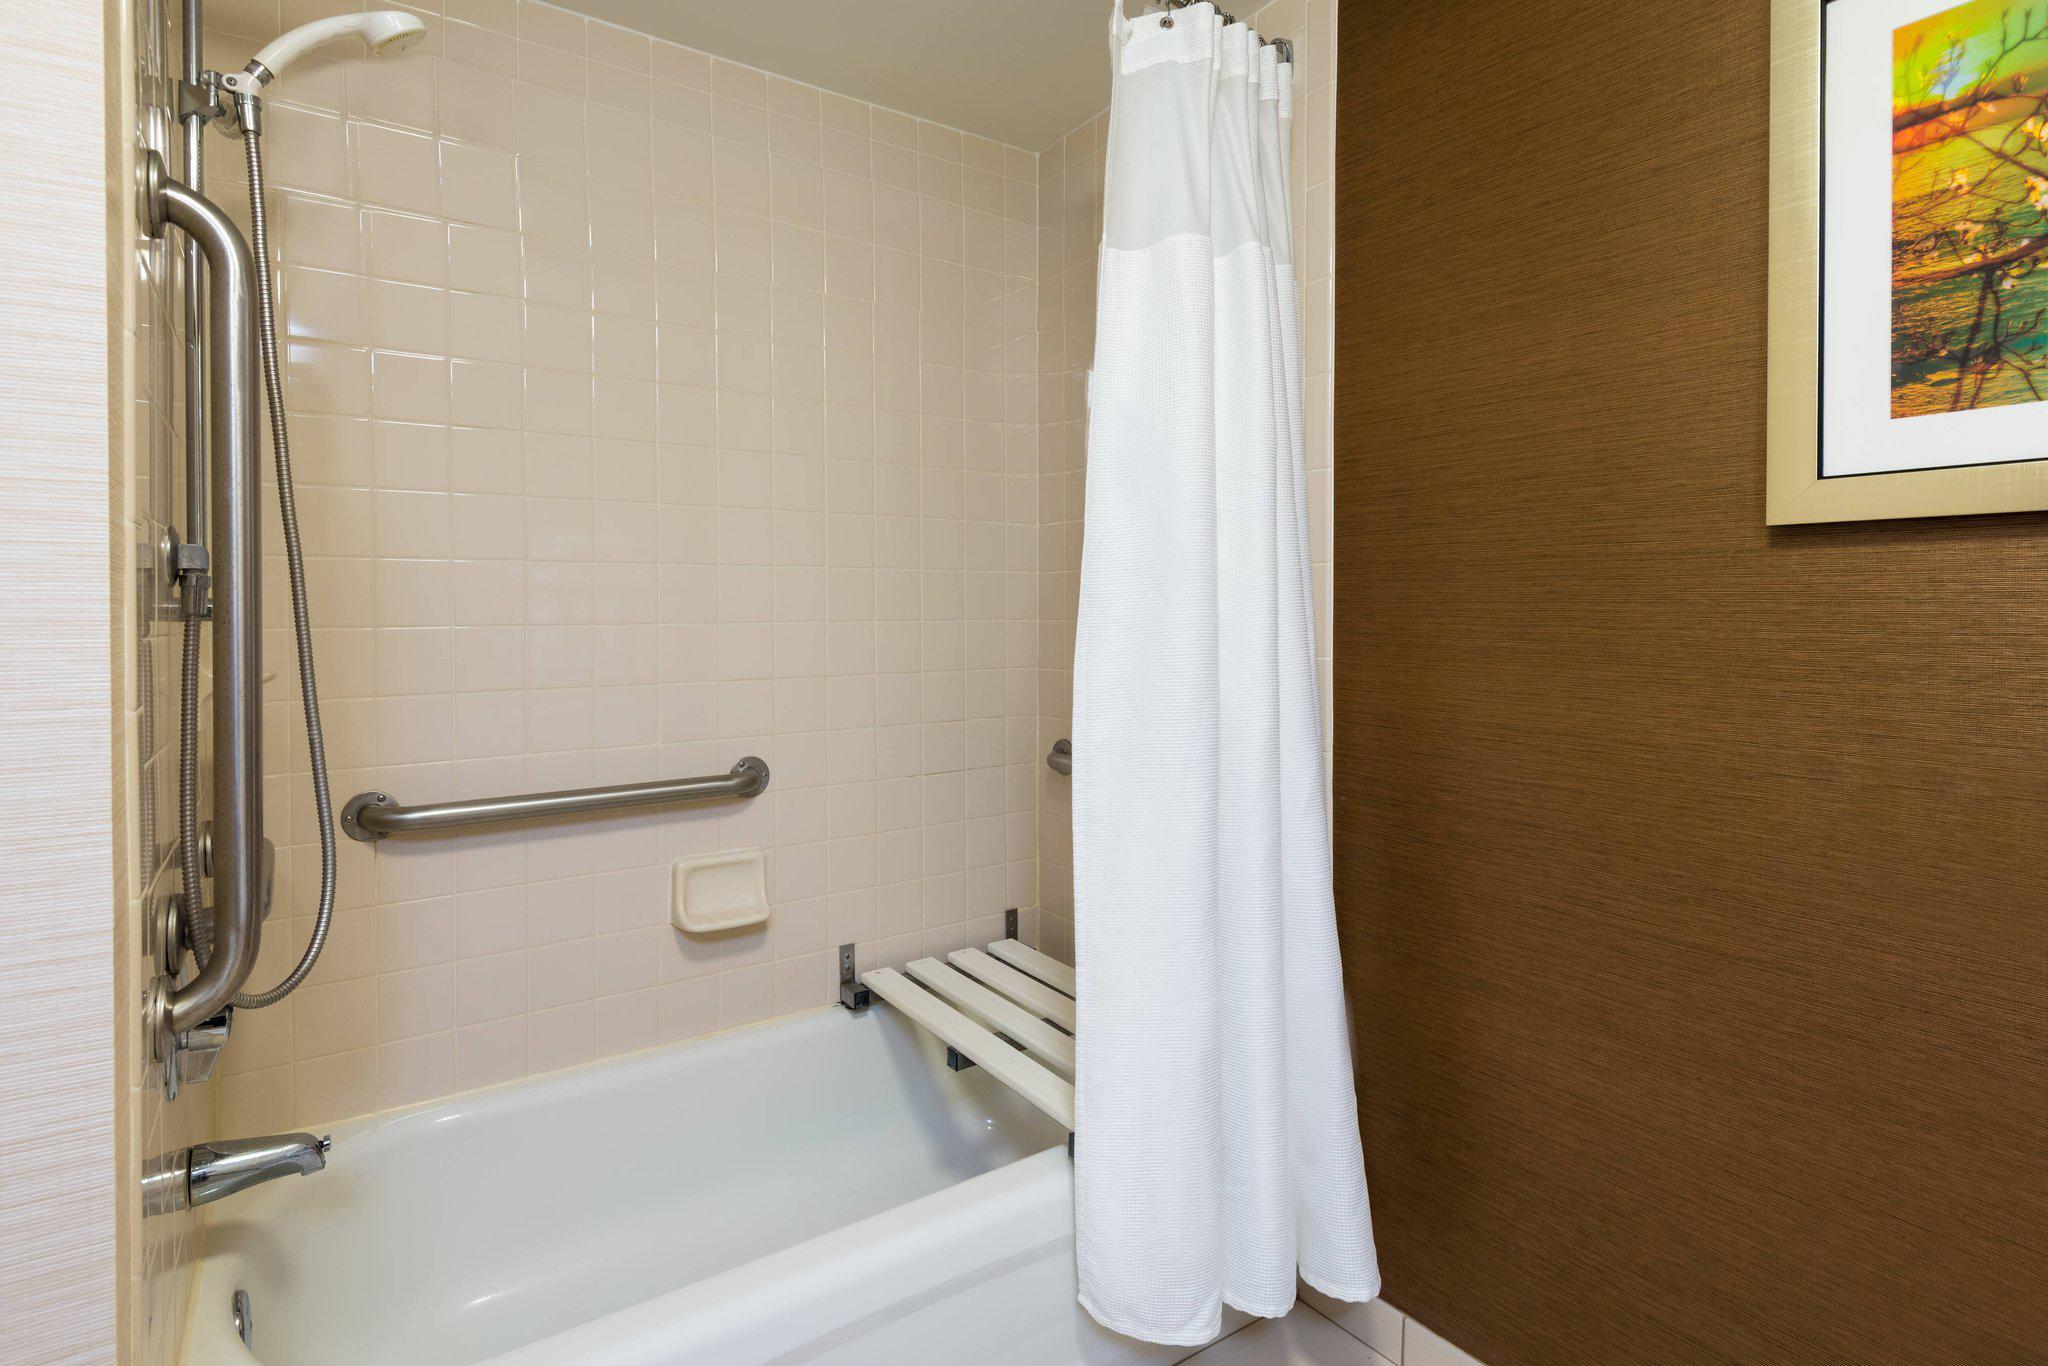 Fairfield Inn & Suites by Marriott Clearwater in Clearwater, FL, photo #13